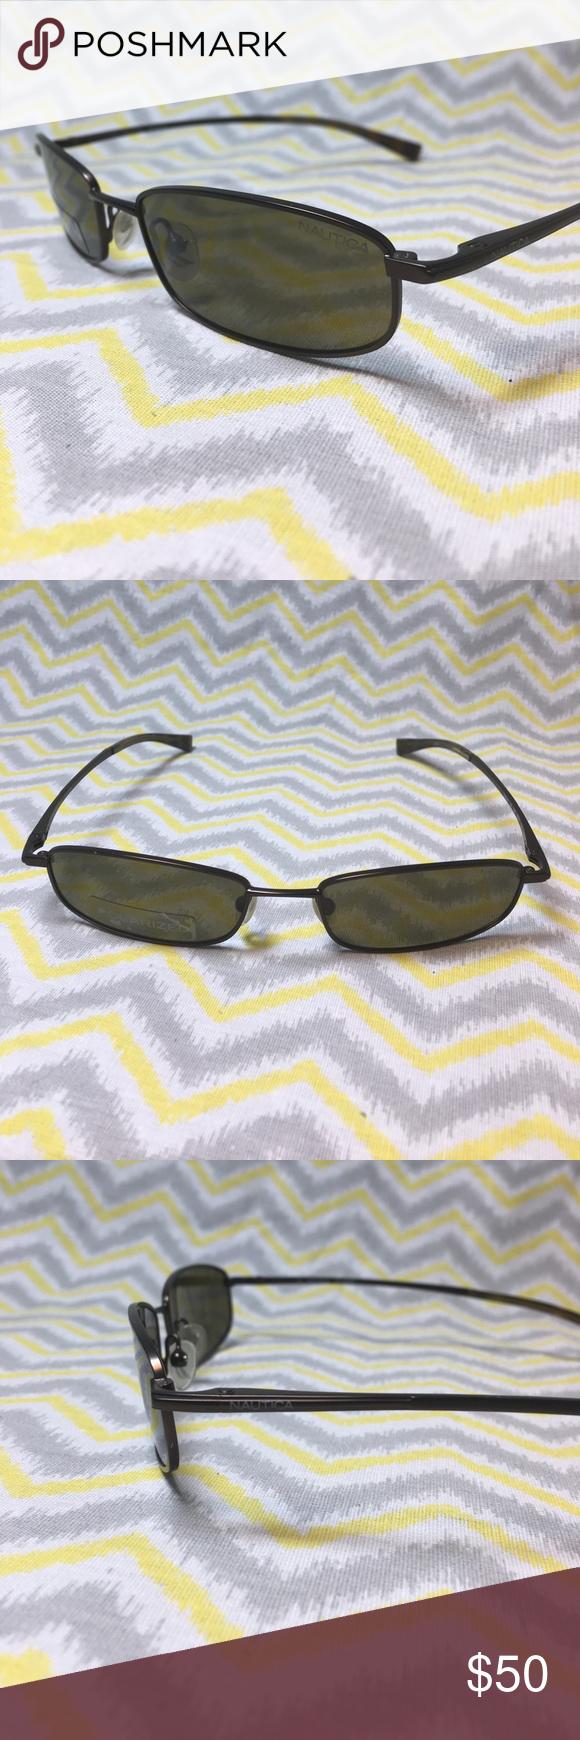 4779fa06dc9 New Nautica Polarized Sunglasses New Nautica Polarized Sunglasses 53 X 17 X  140mm Nautica Accessories Glasses